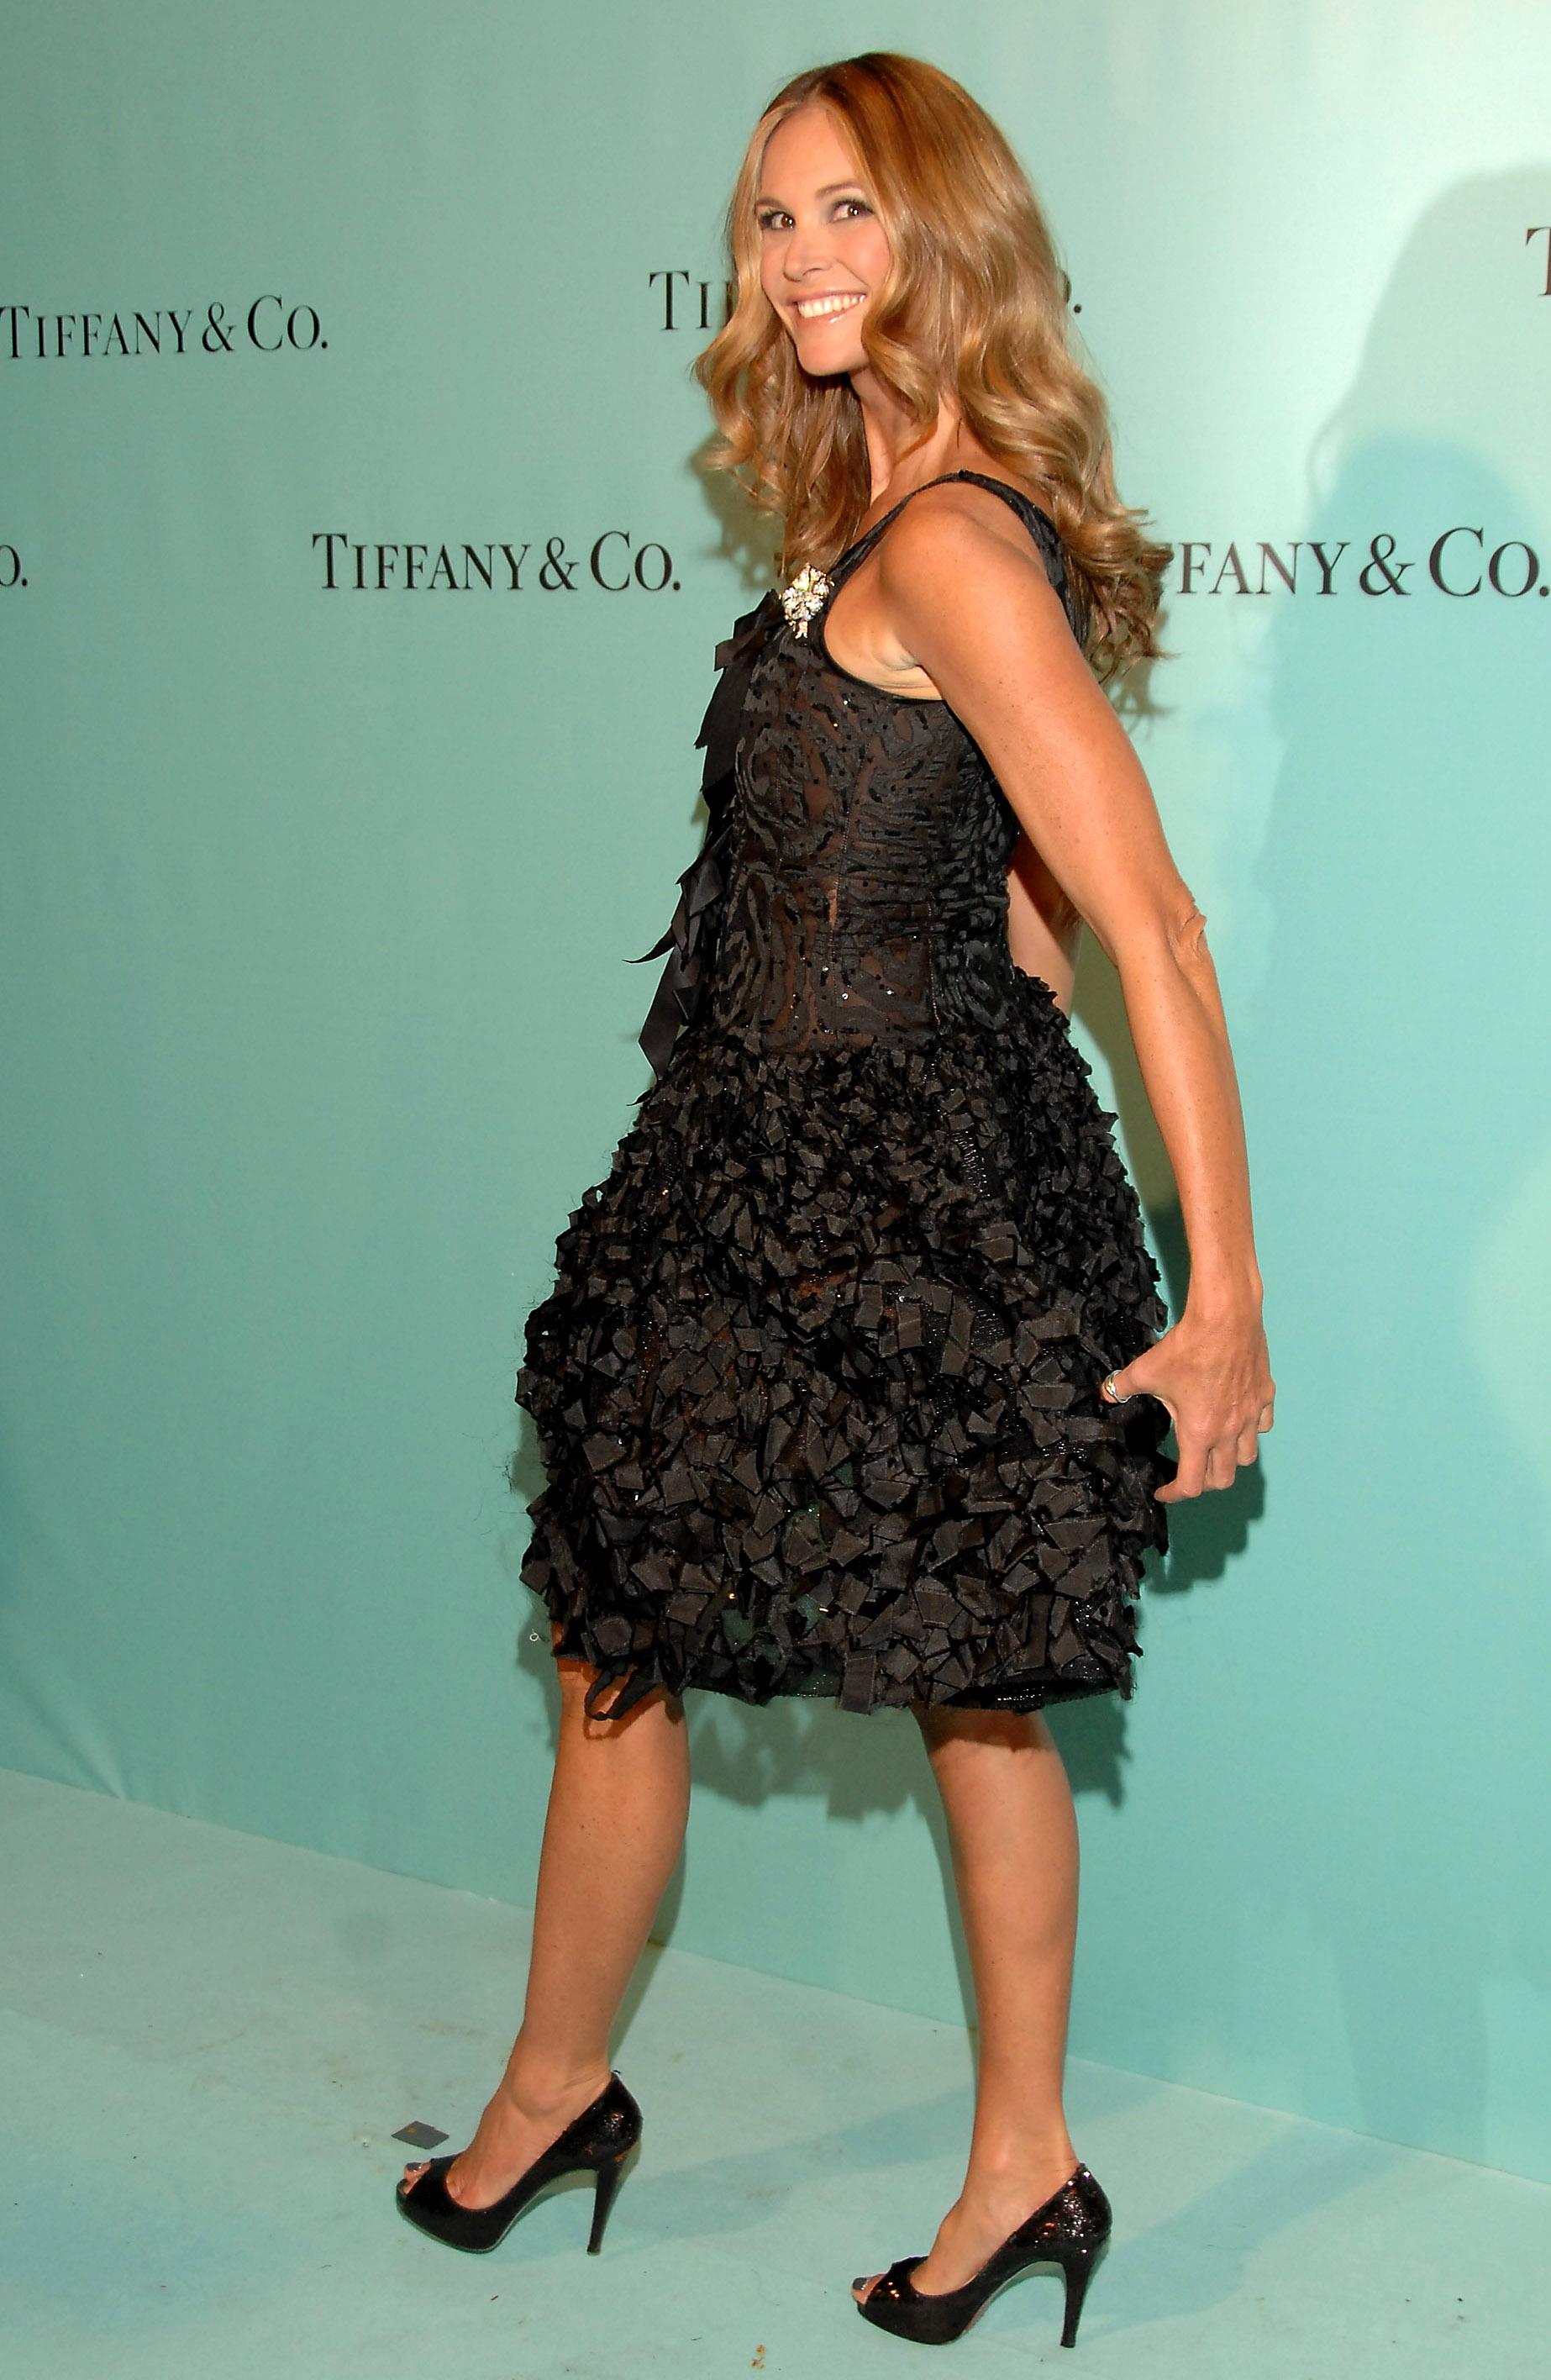 81339_Celebutopia-Elle_Macpherson-Tiffany_1_Co._Store_Opening_in_Madrid-25_122_817lo.jpg